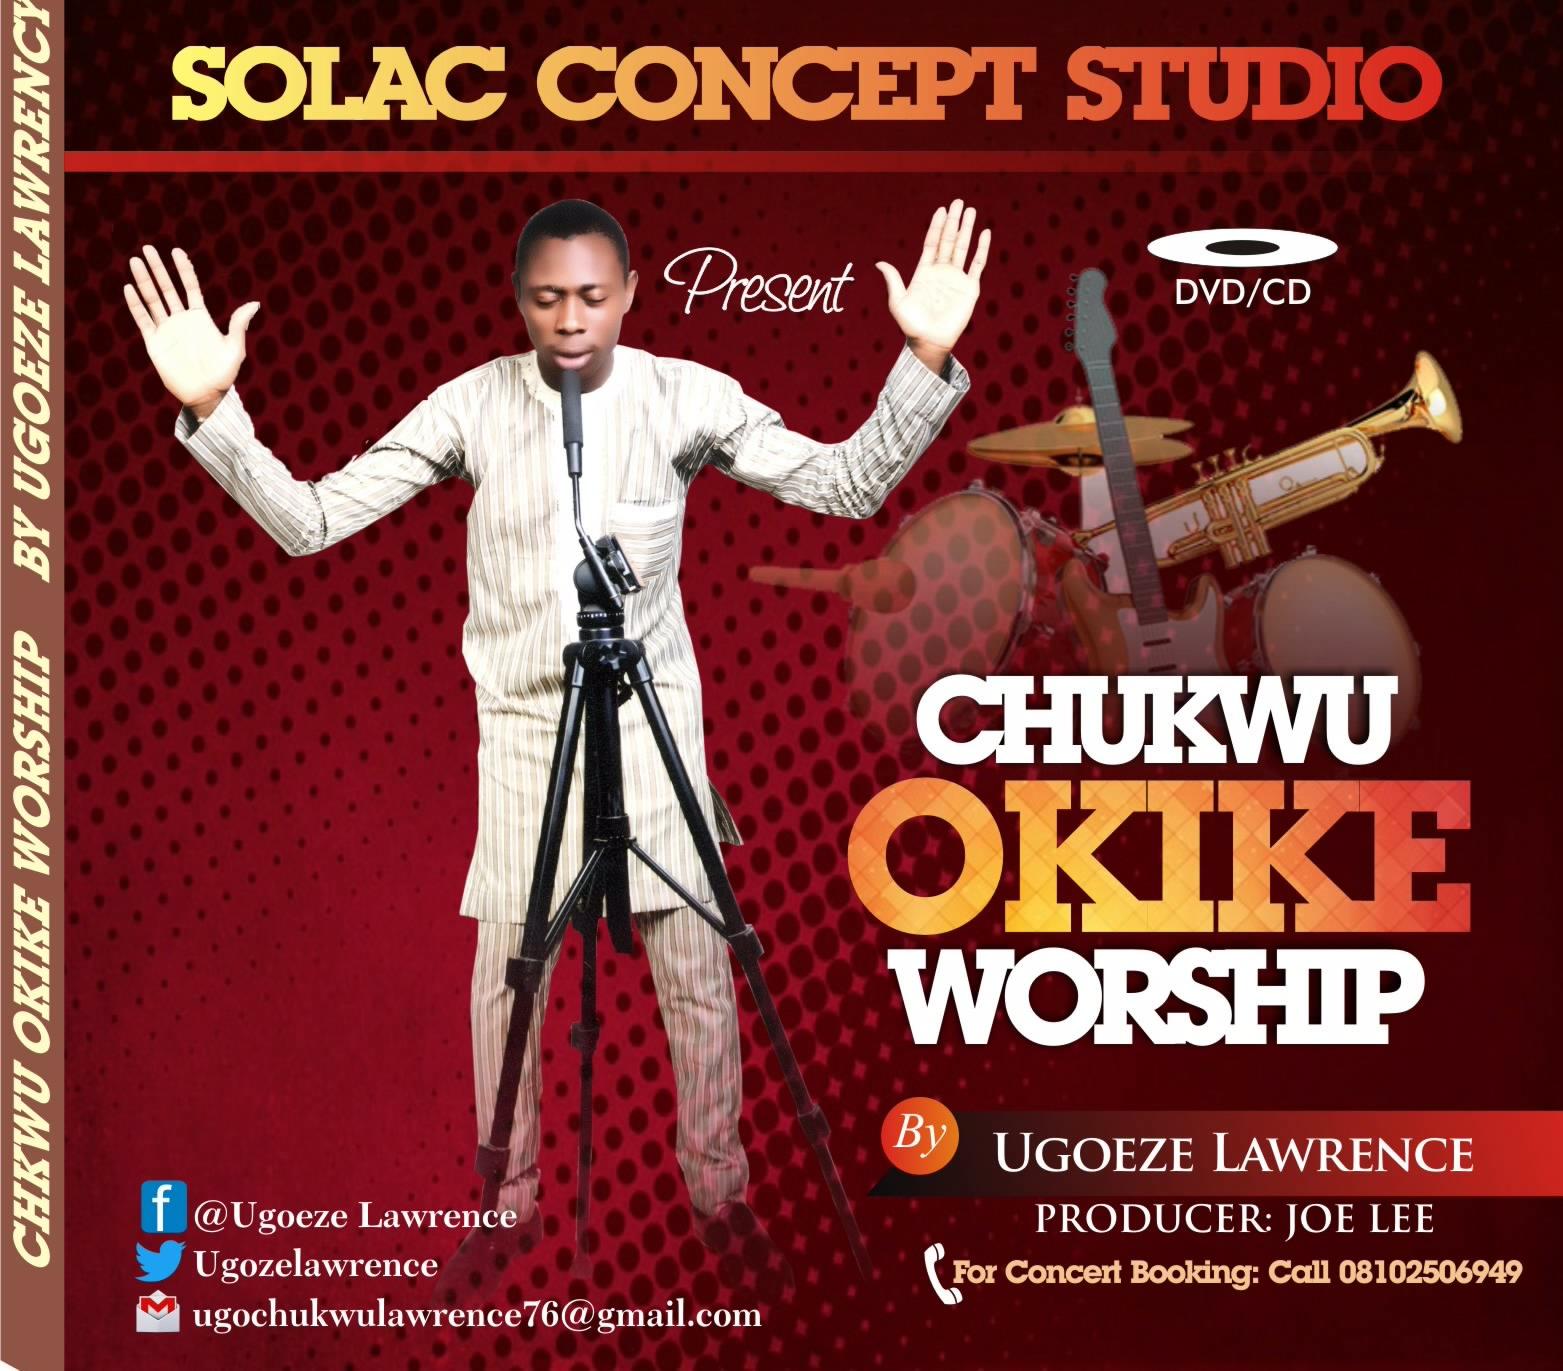 CHUKWU OKIKE by Ugoeze Lawrence art cover